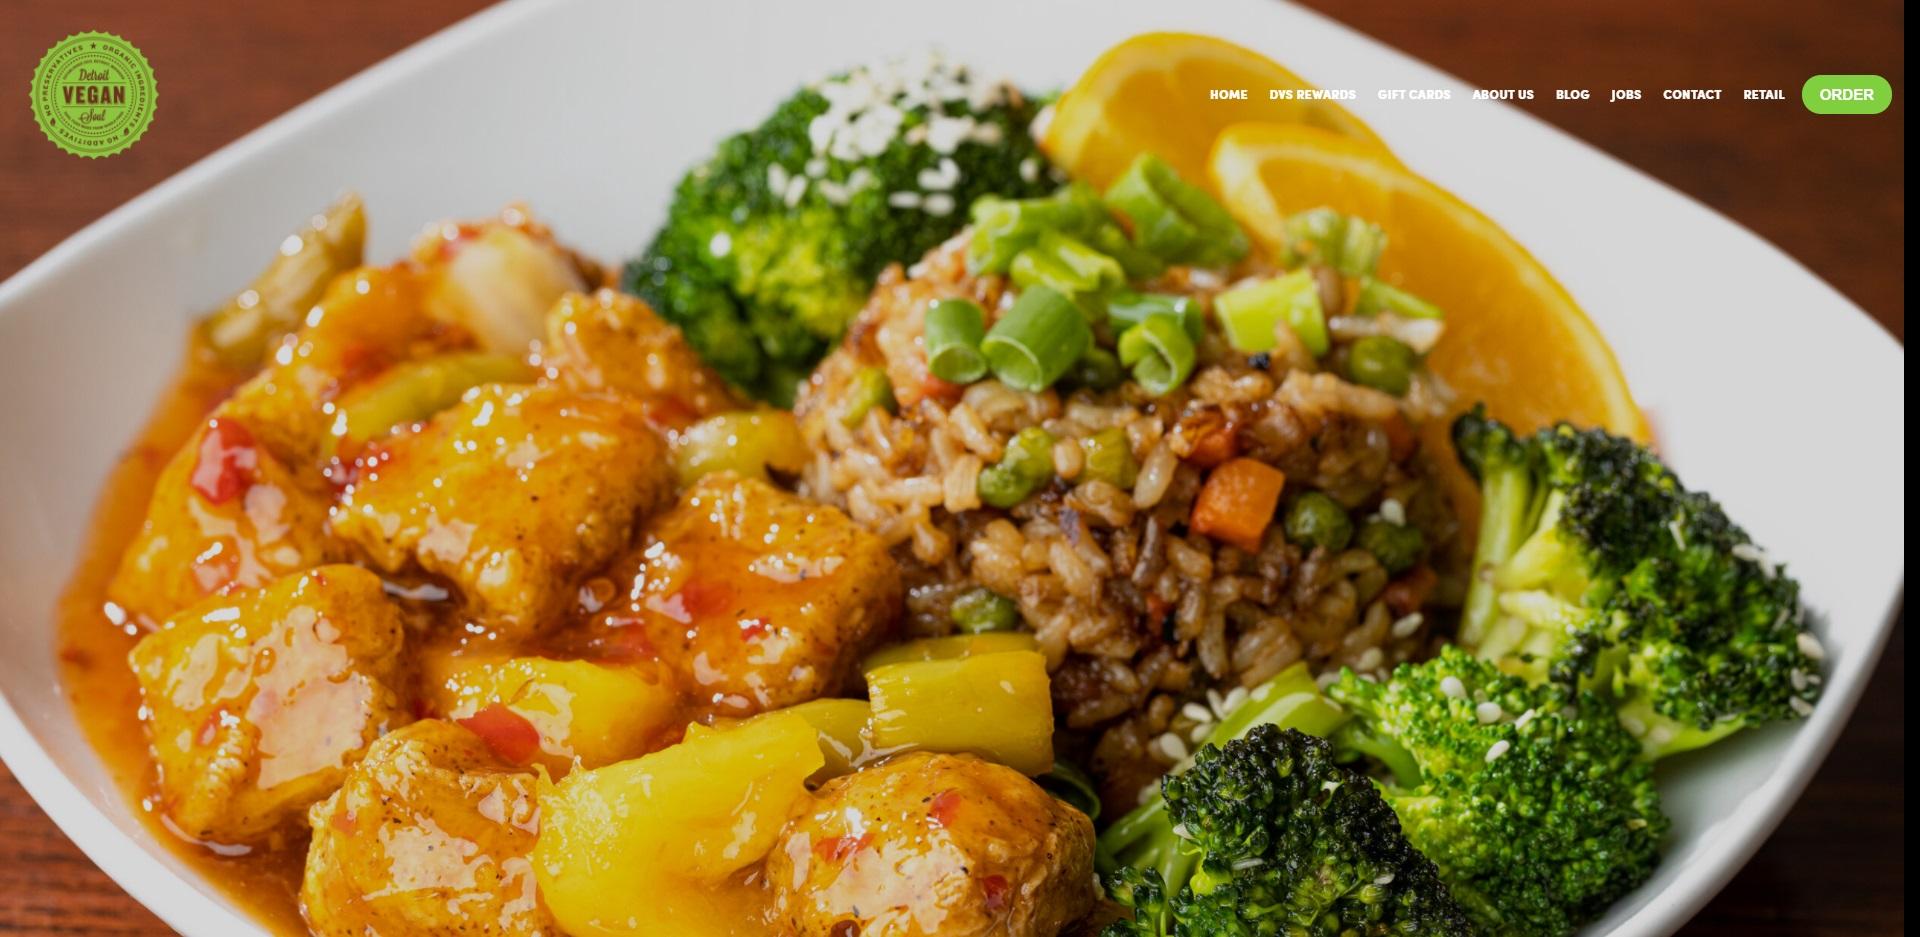 Best Vegetarian Restaurants in Detroit, MI